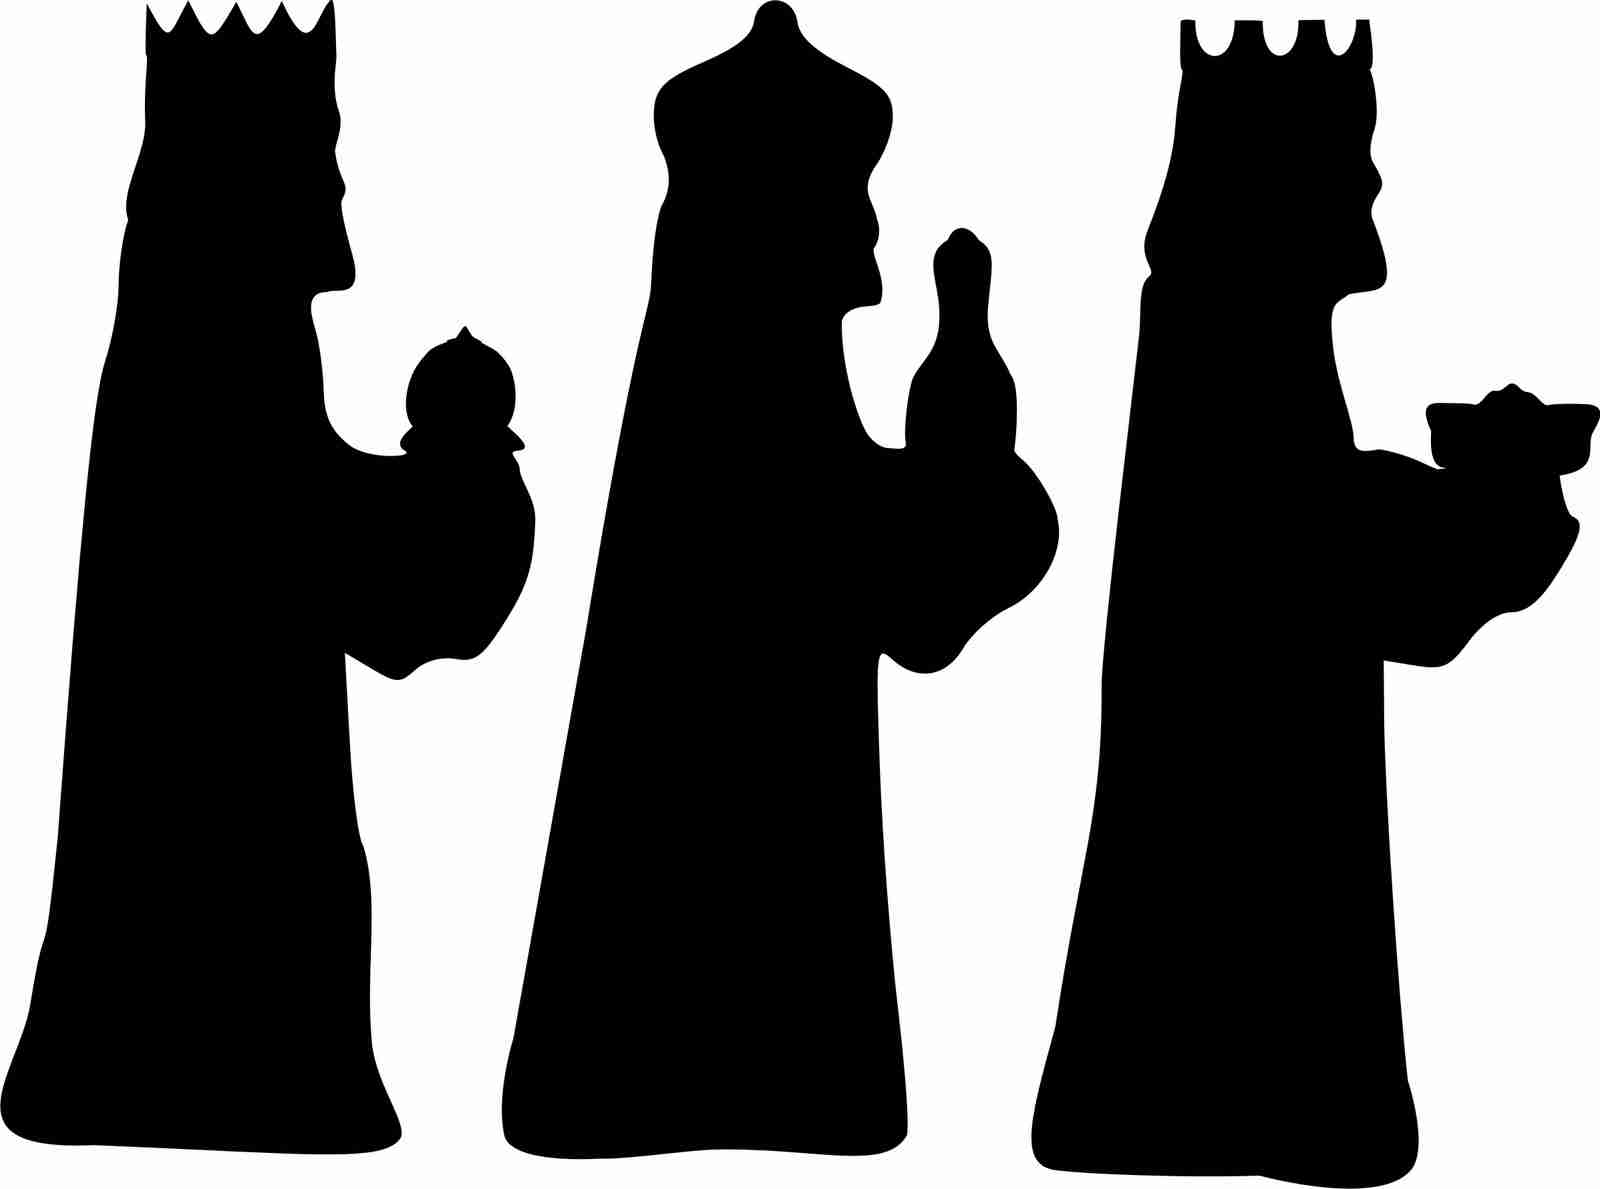 Wise Men Silhouette at GetDrawings.com.